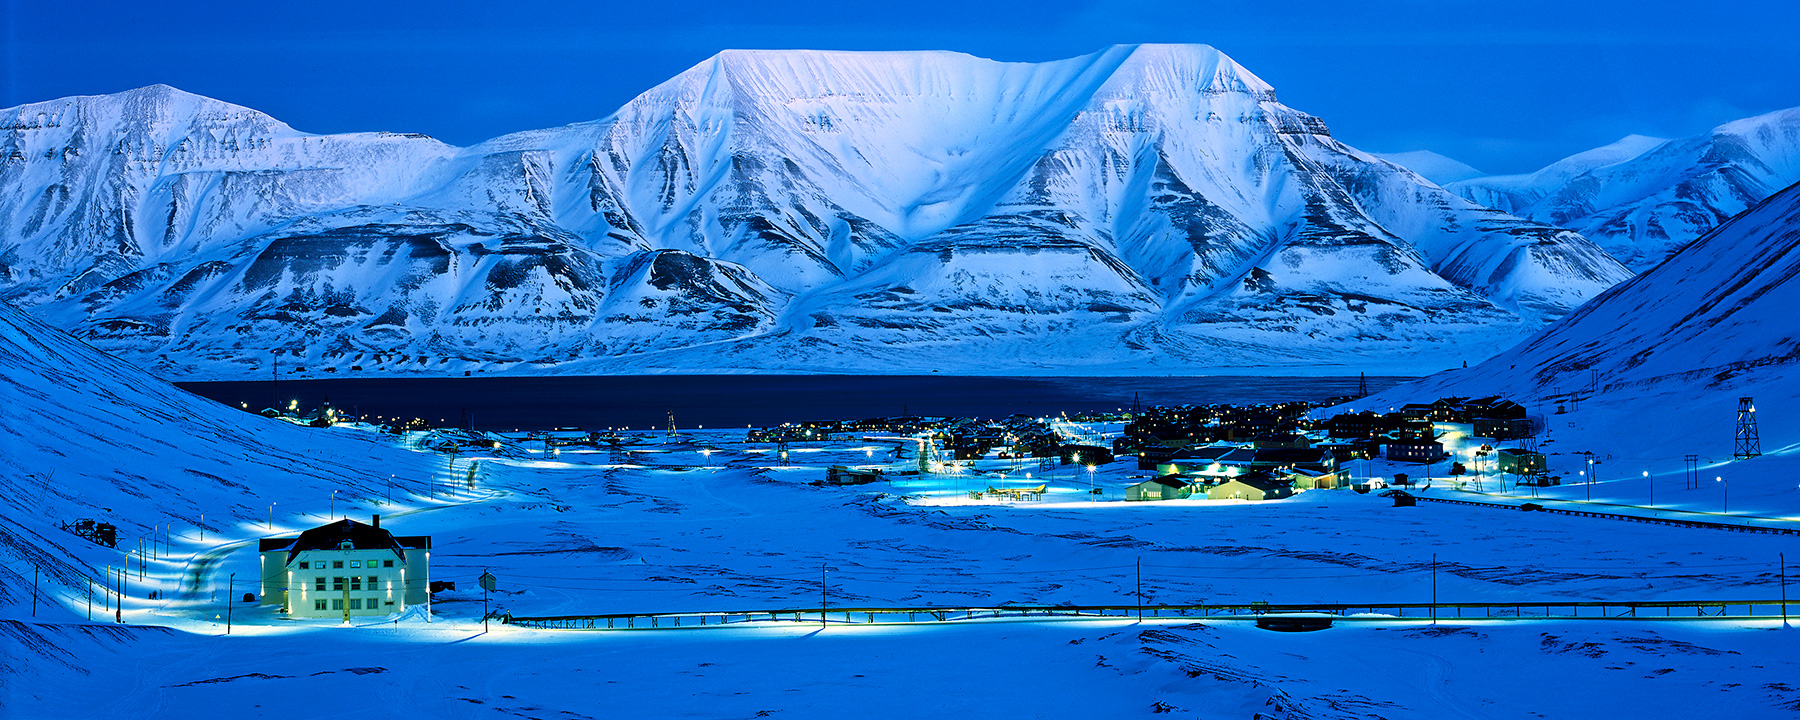 2. Svalbard